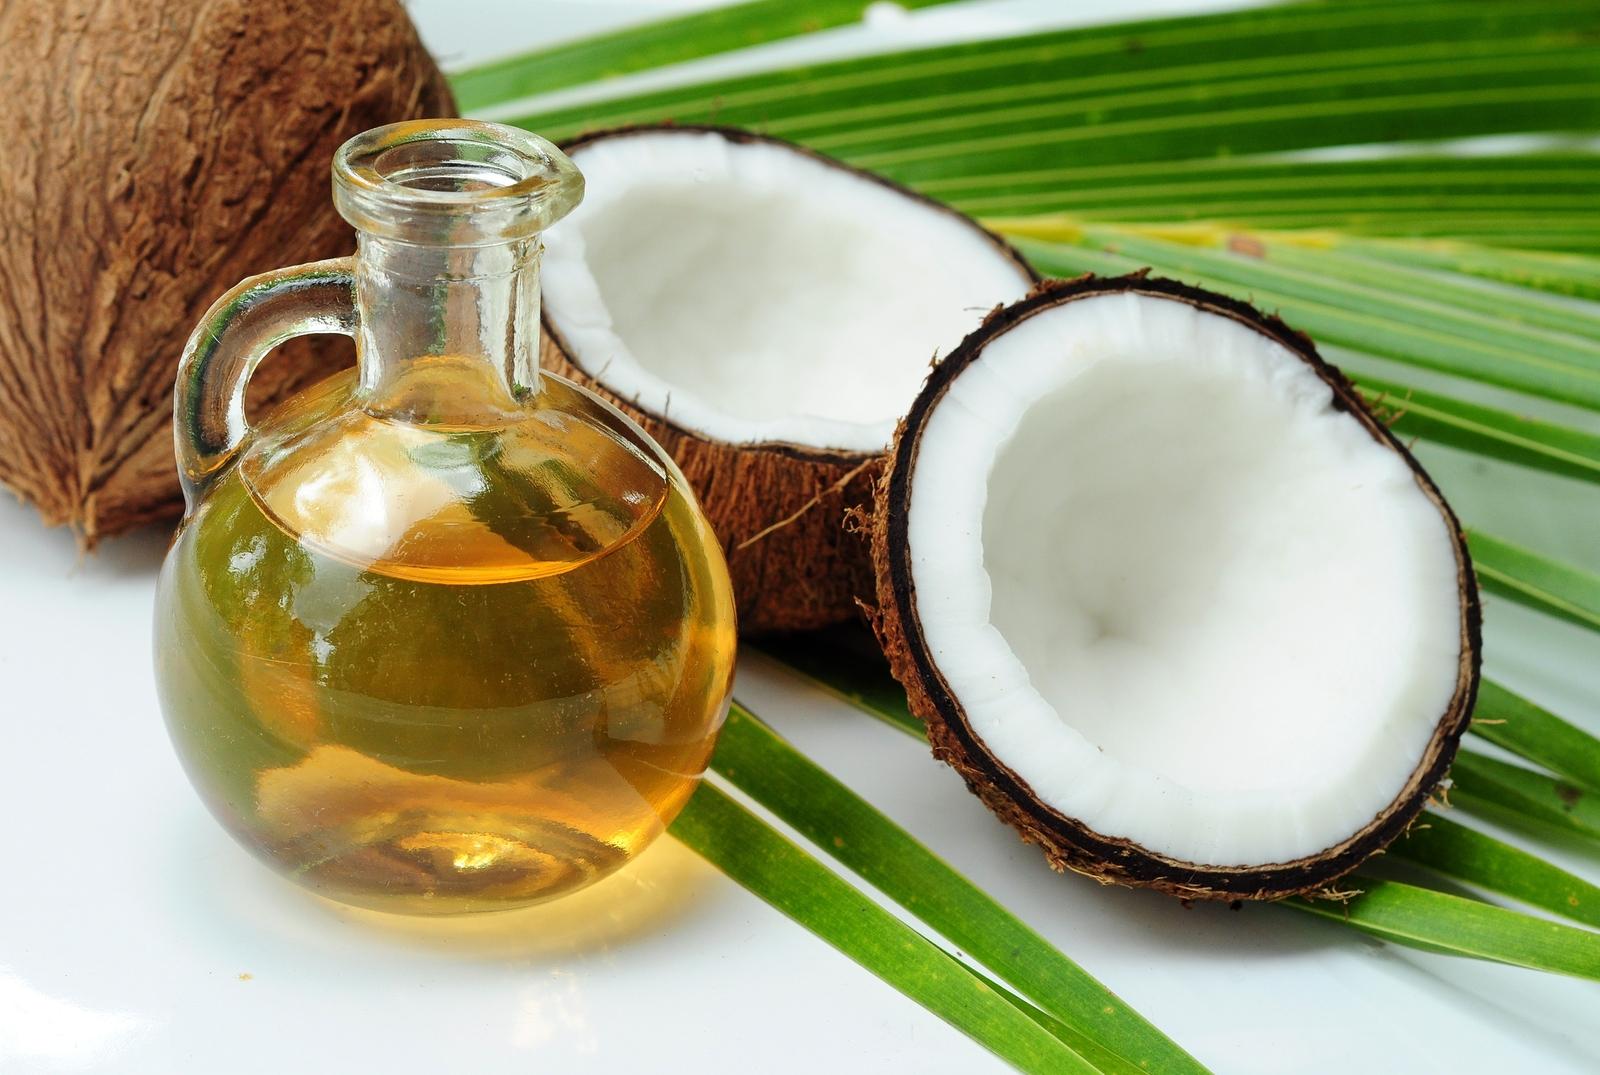 Coconut oil for alternative therapy